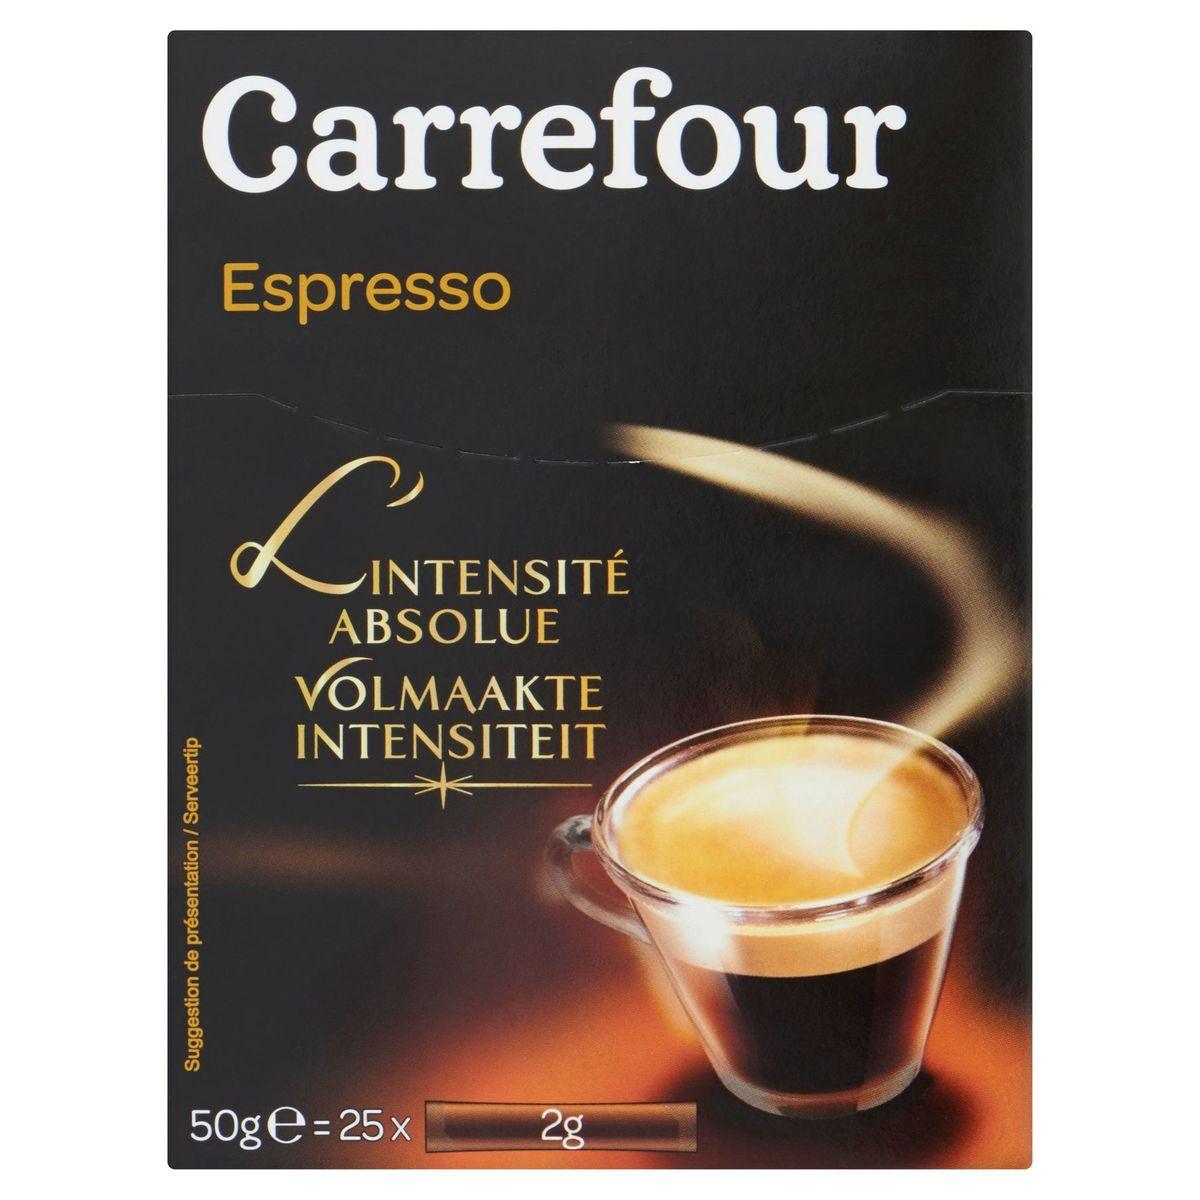 Carrefour Espresso l'Intensité Absolue 25 x 2 g